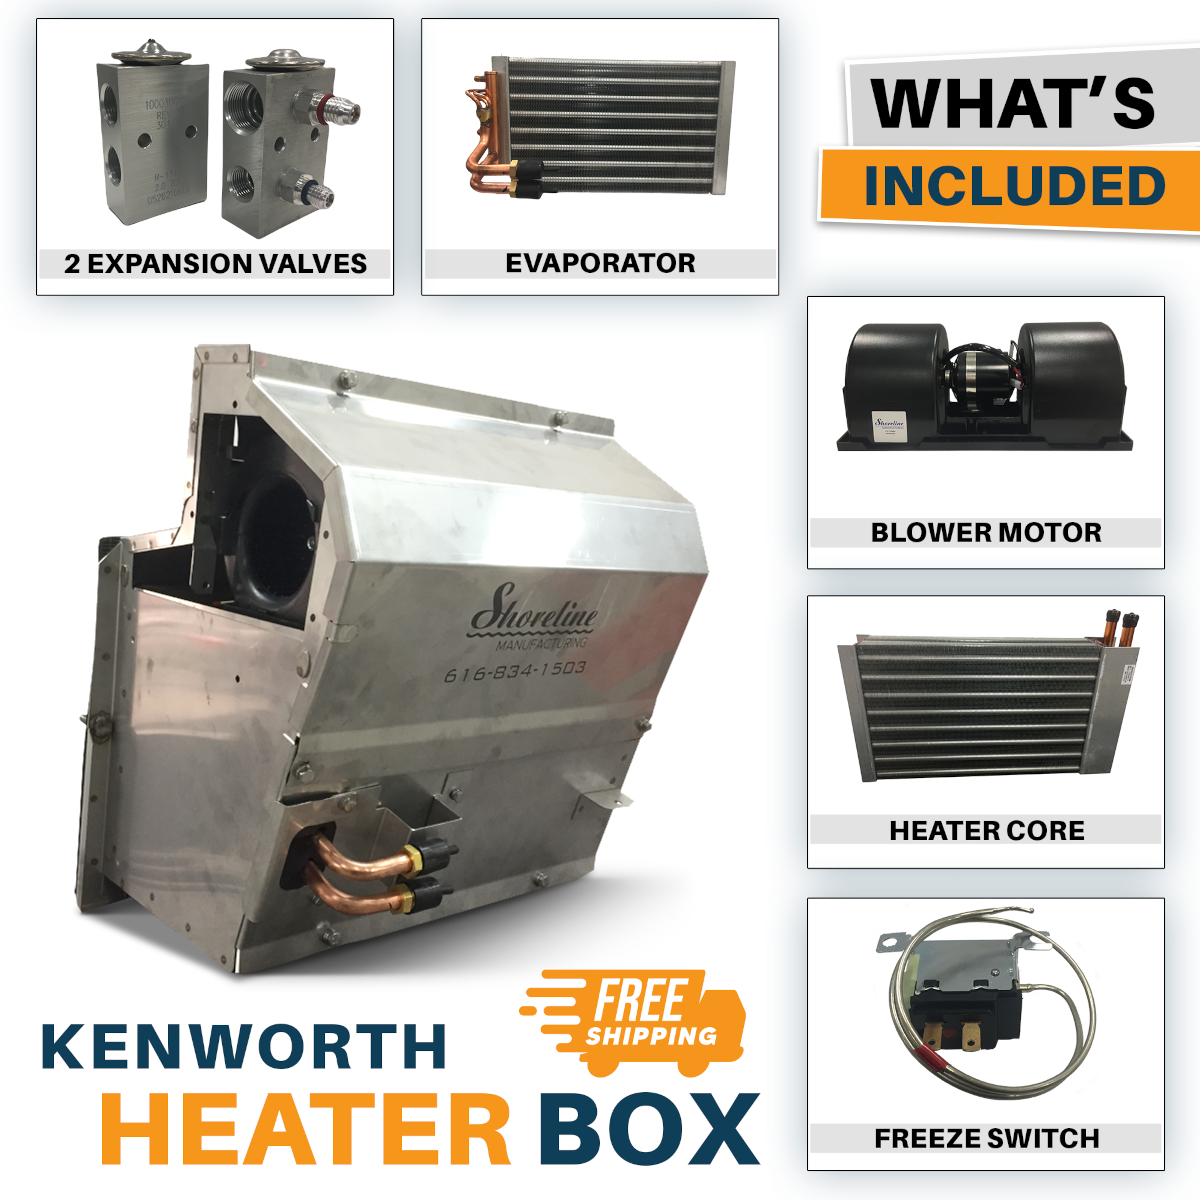 Kenworth Heater Box   HVAC Box   Heater Core Box